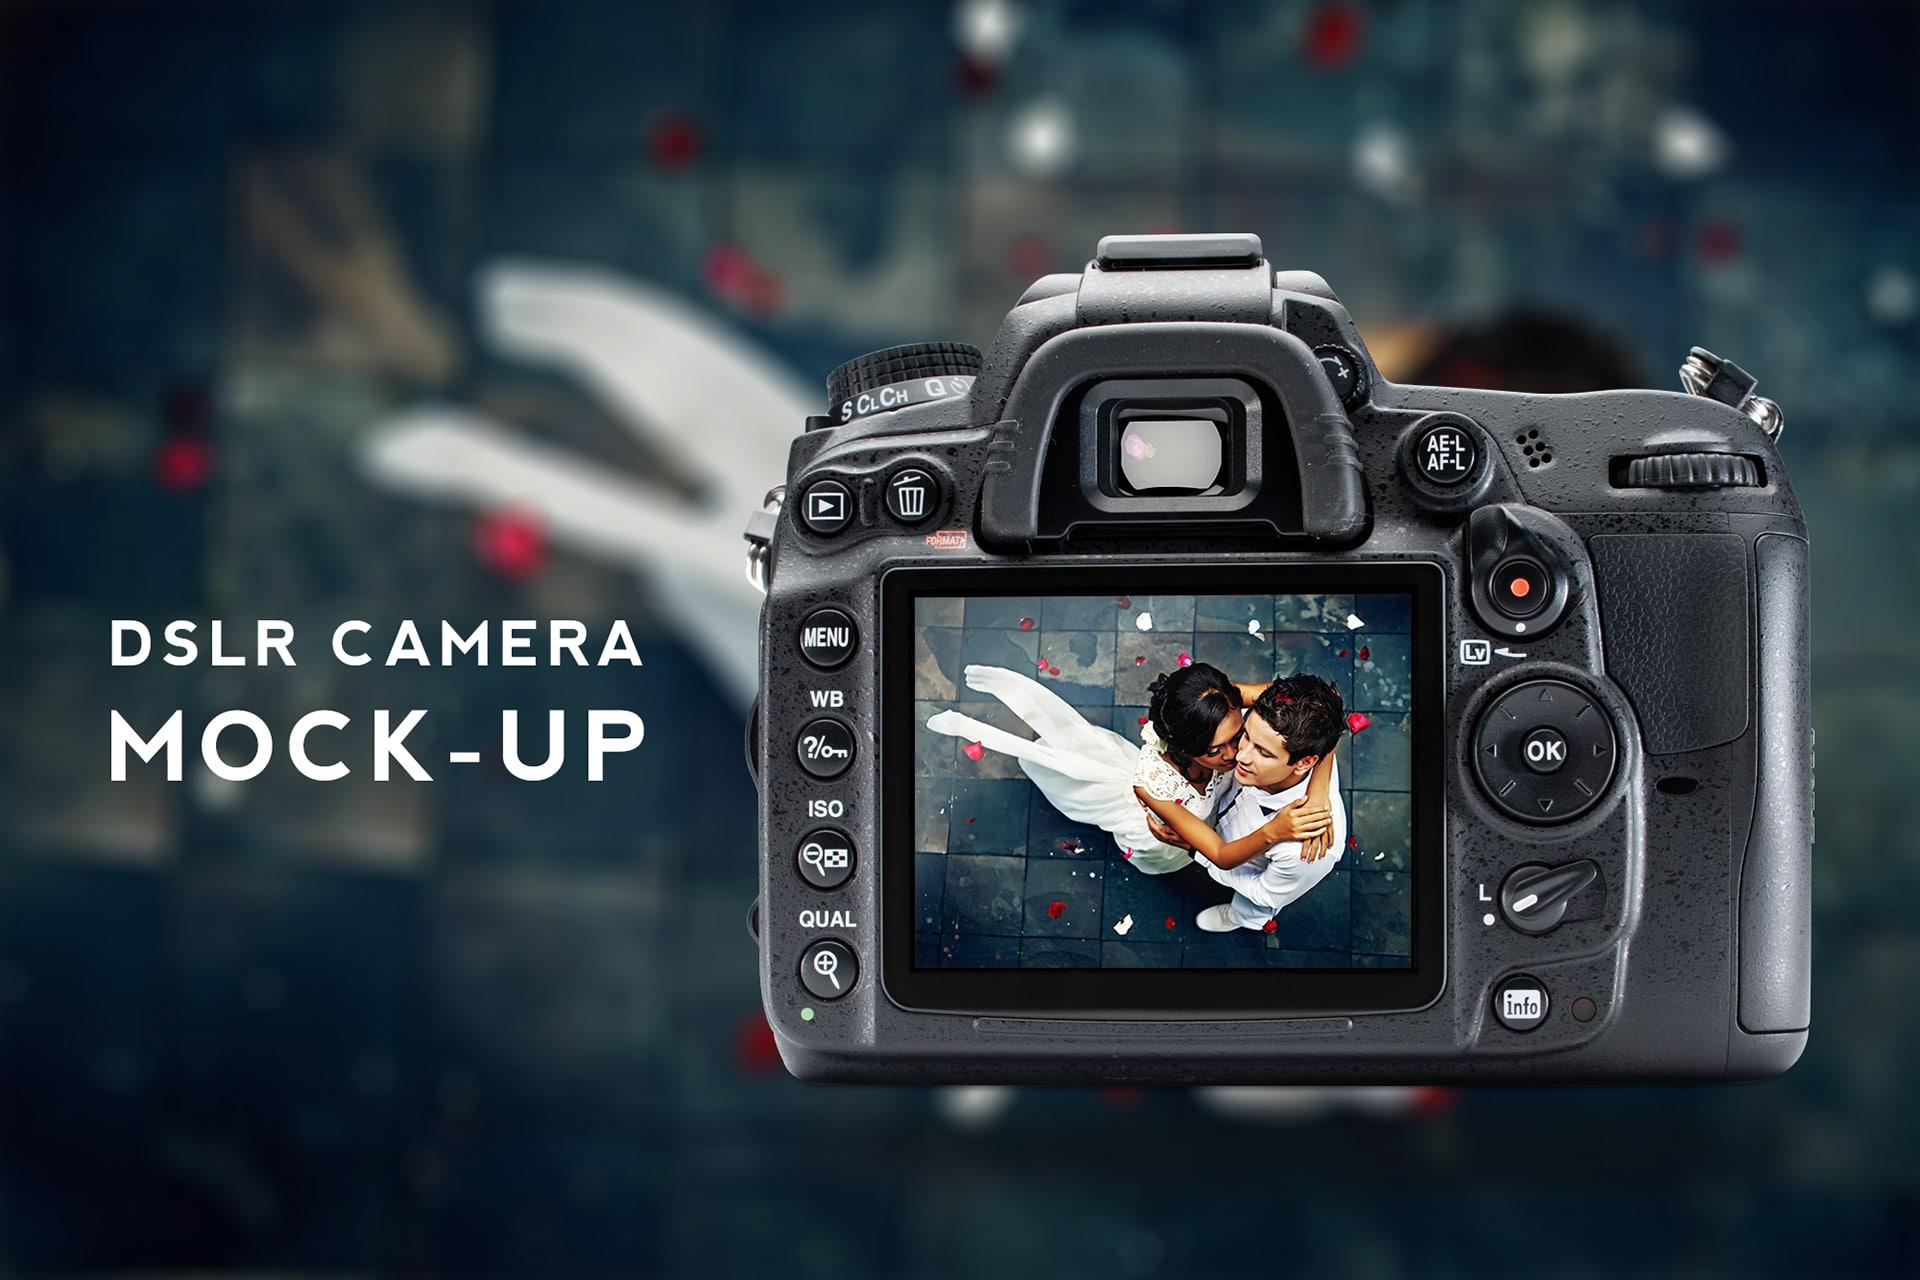 Customizable DSLR Camera